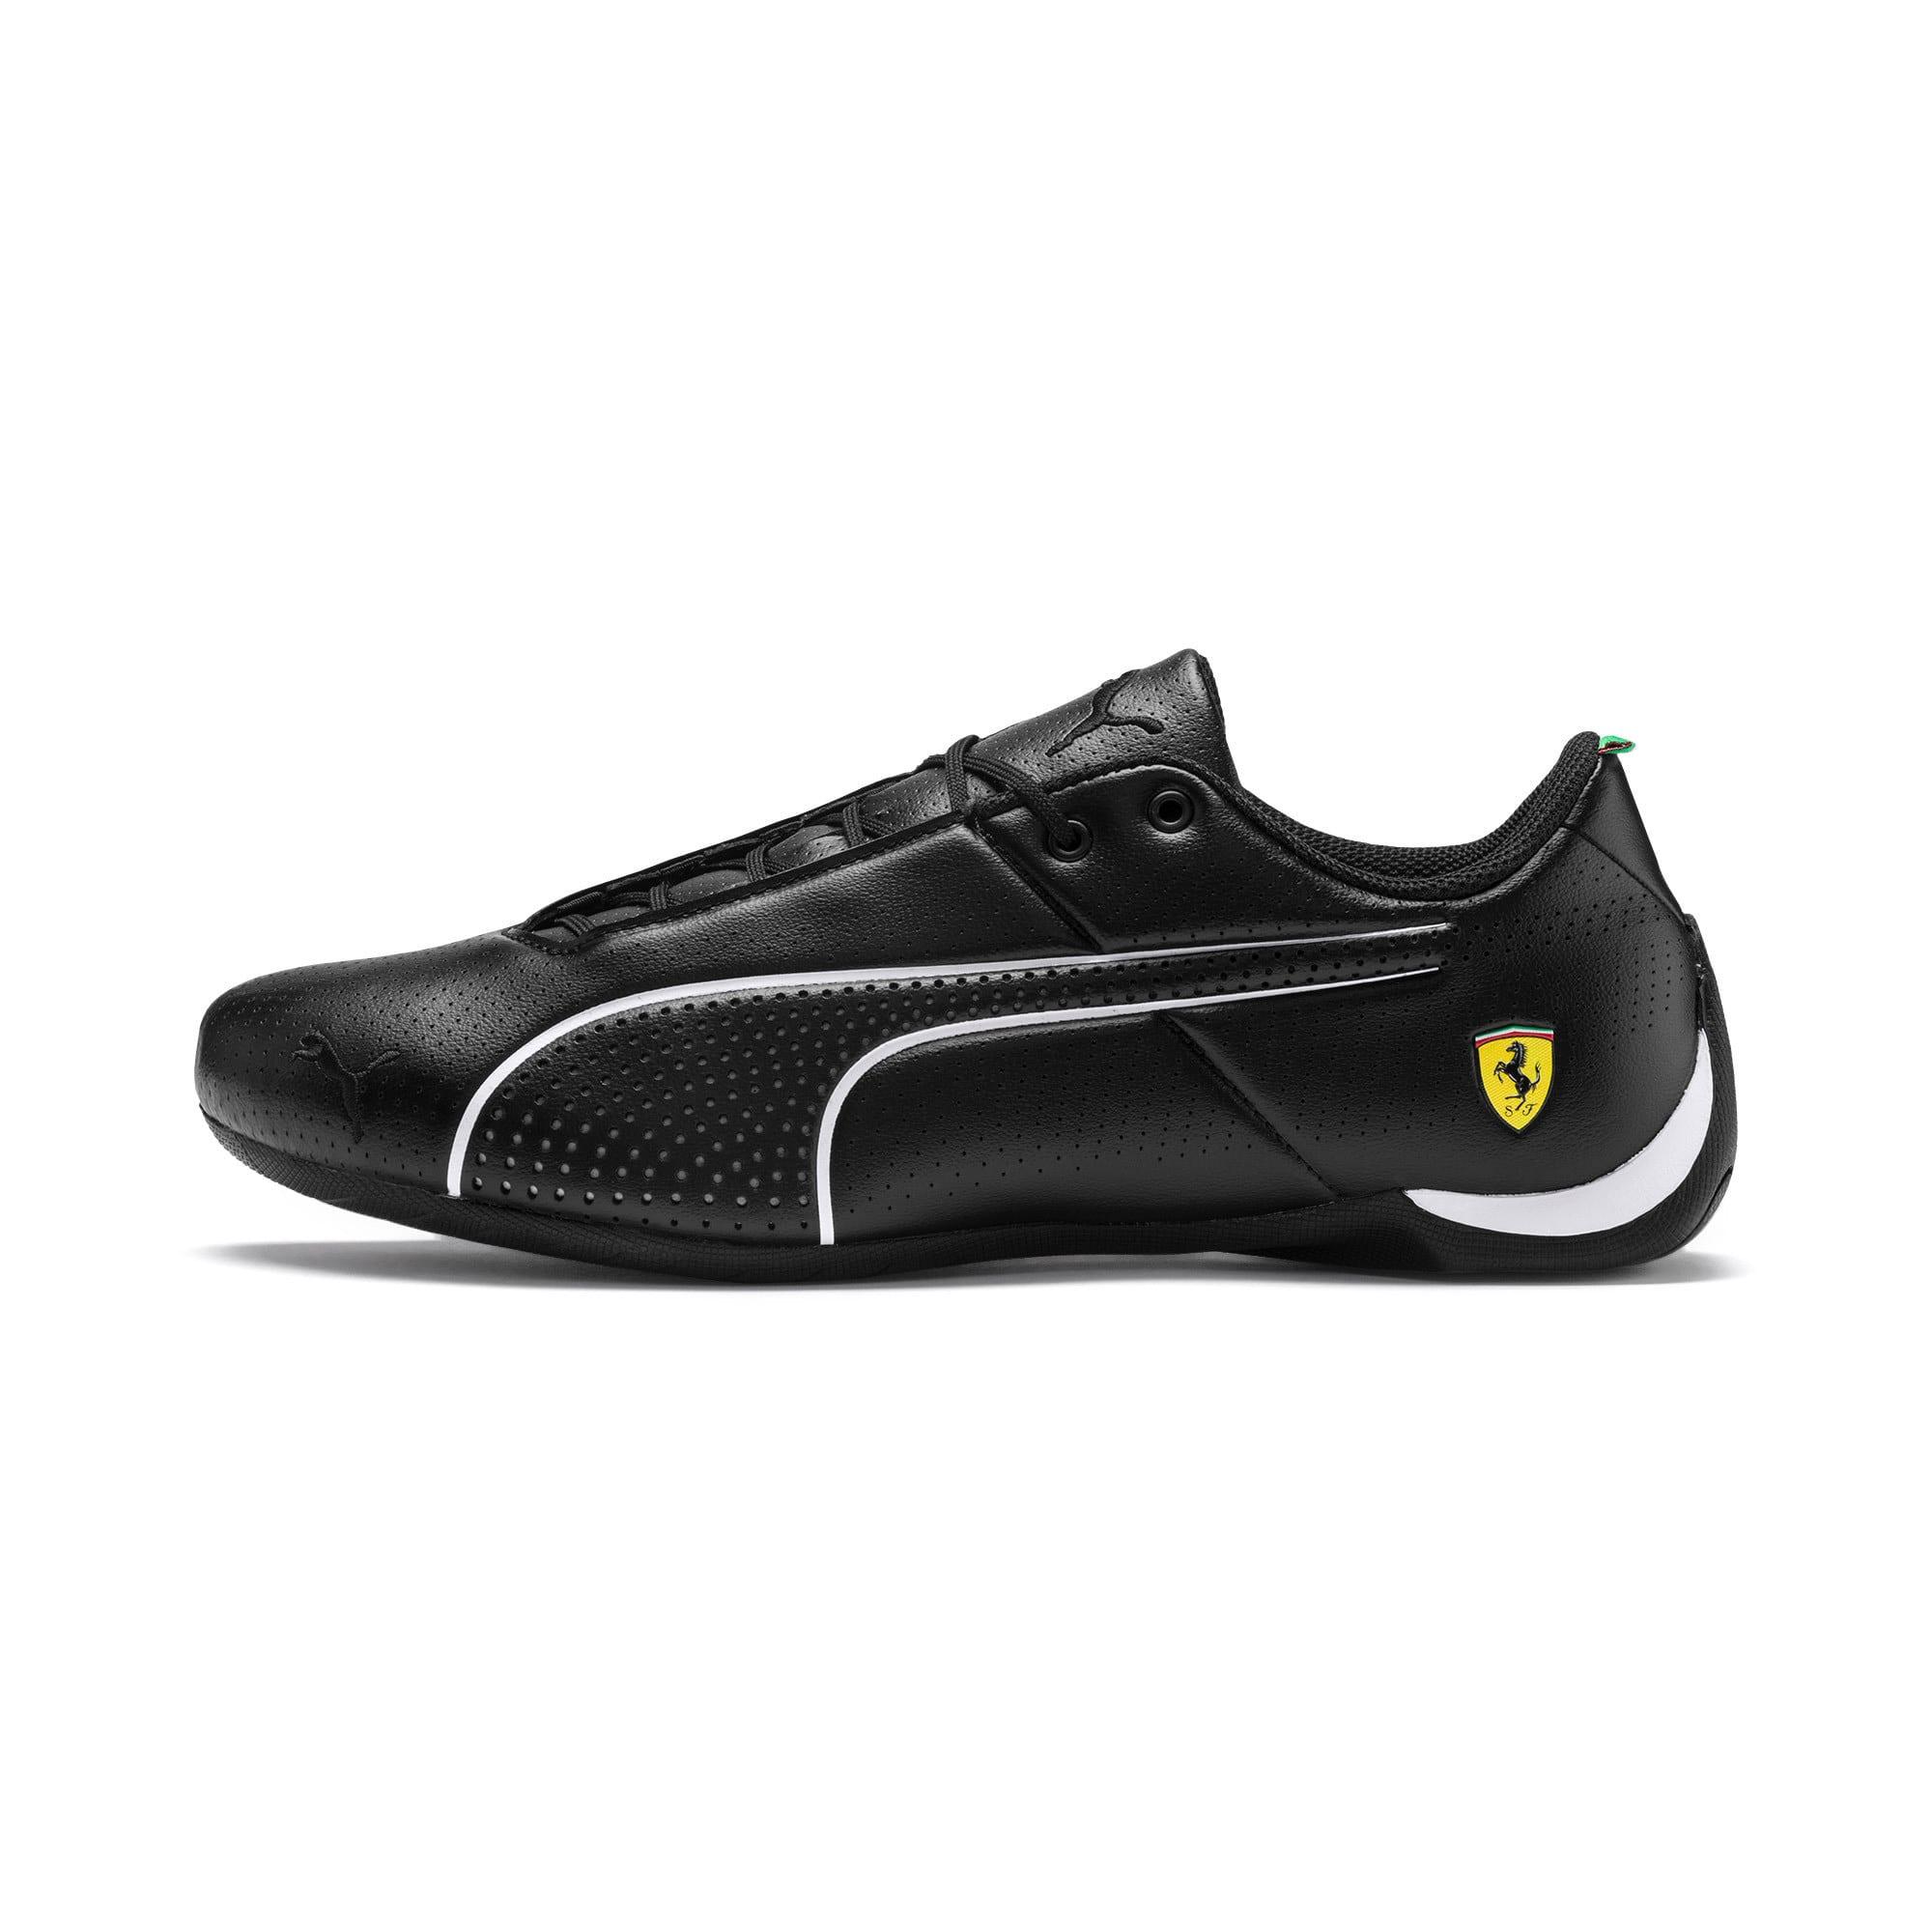 Thumbnail 1 of Scuderia Ferrari Future Cat Ultra Shoes, Puma Black-Puma White, medium